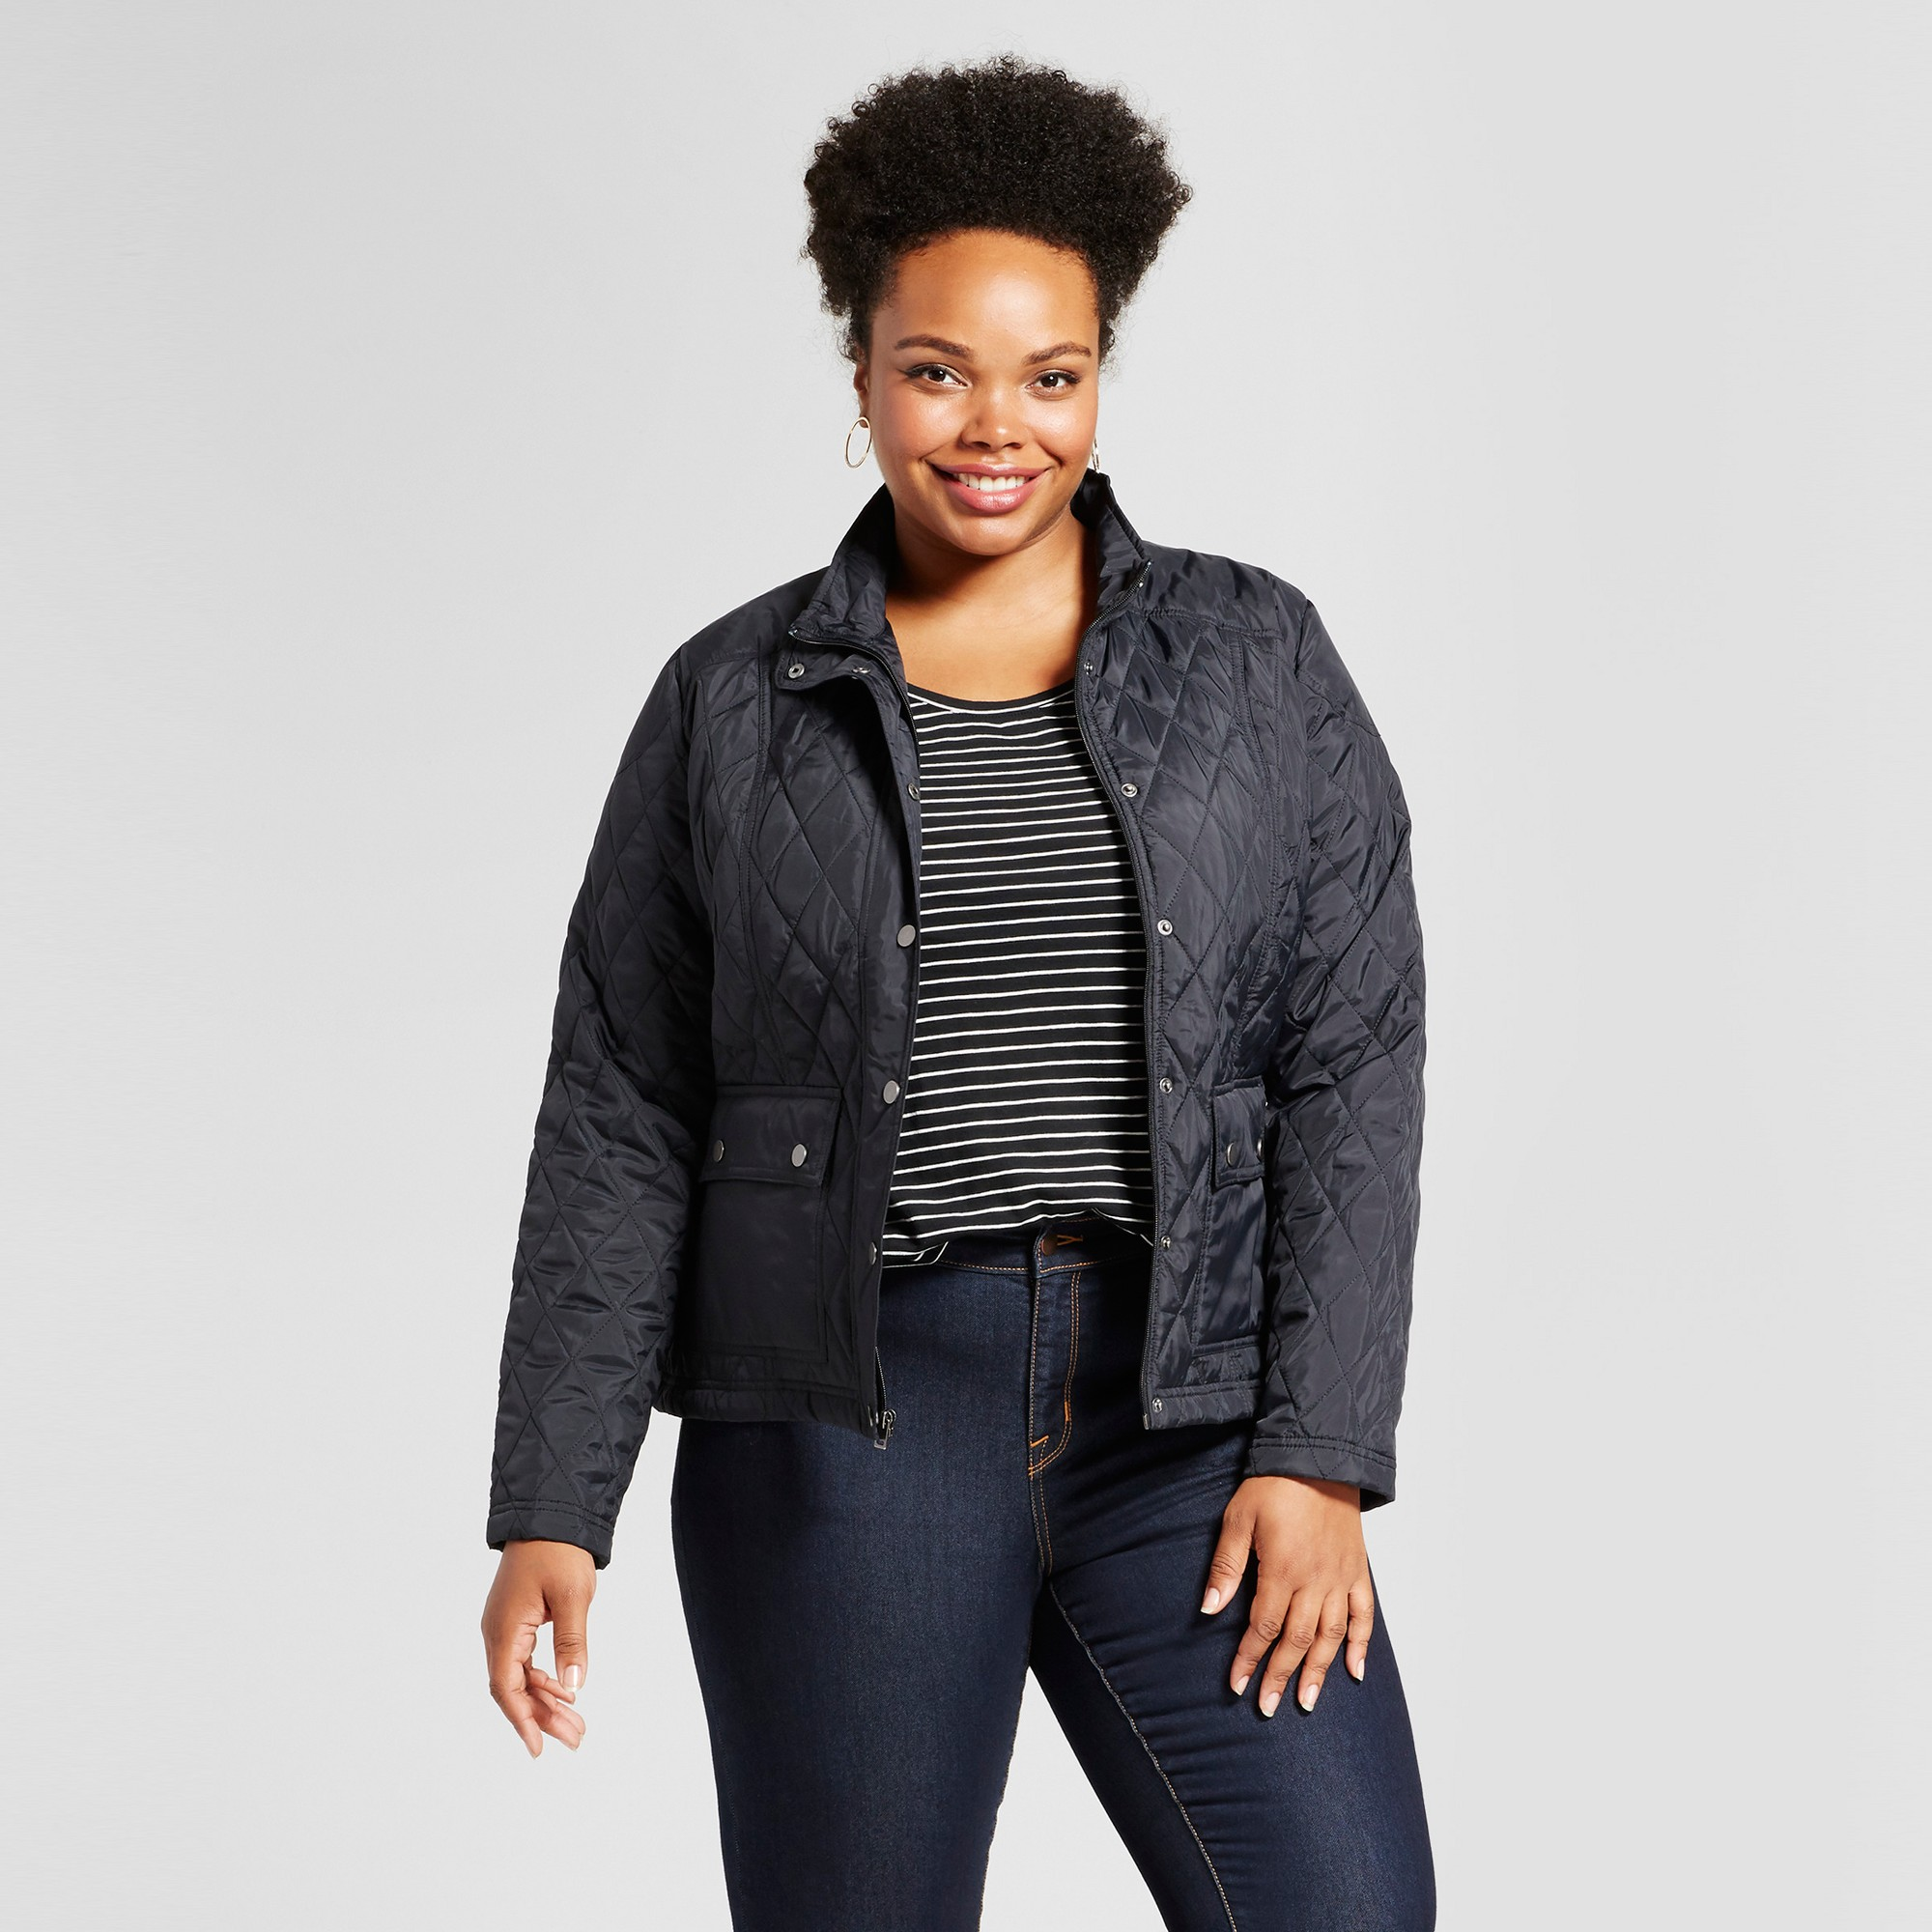 Women's Plus Size Quilted Jacket - Ava & Viv Black 1X